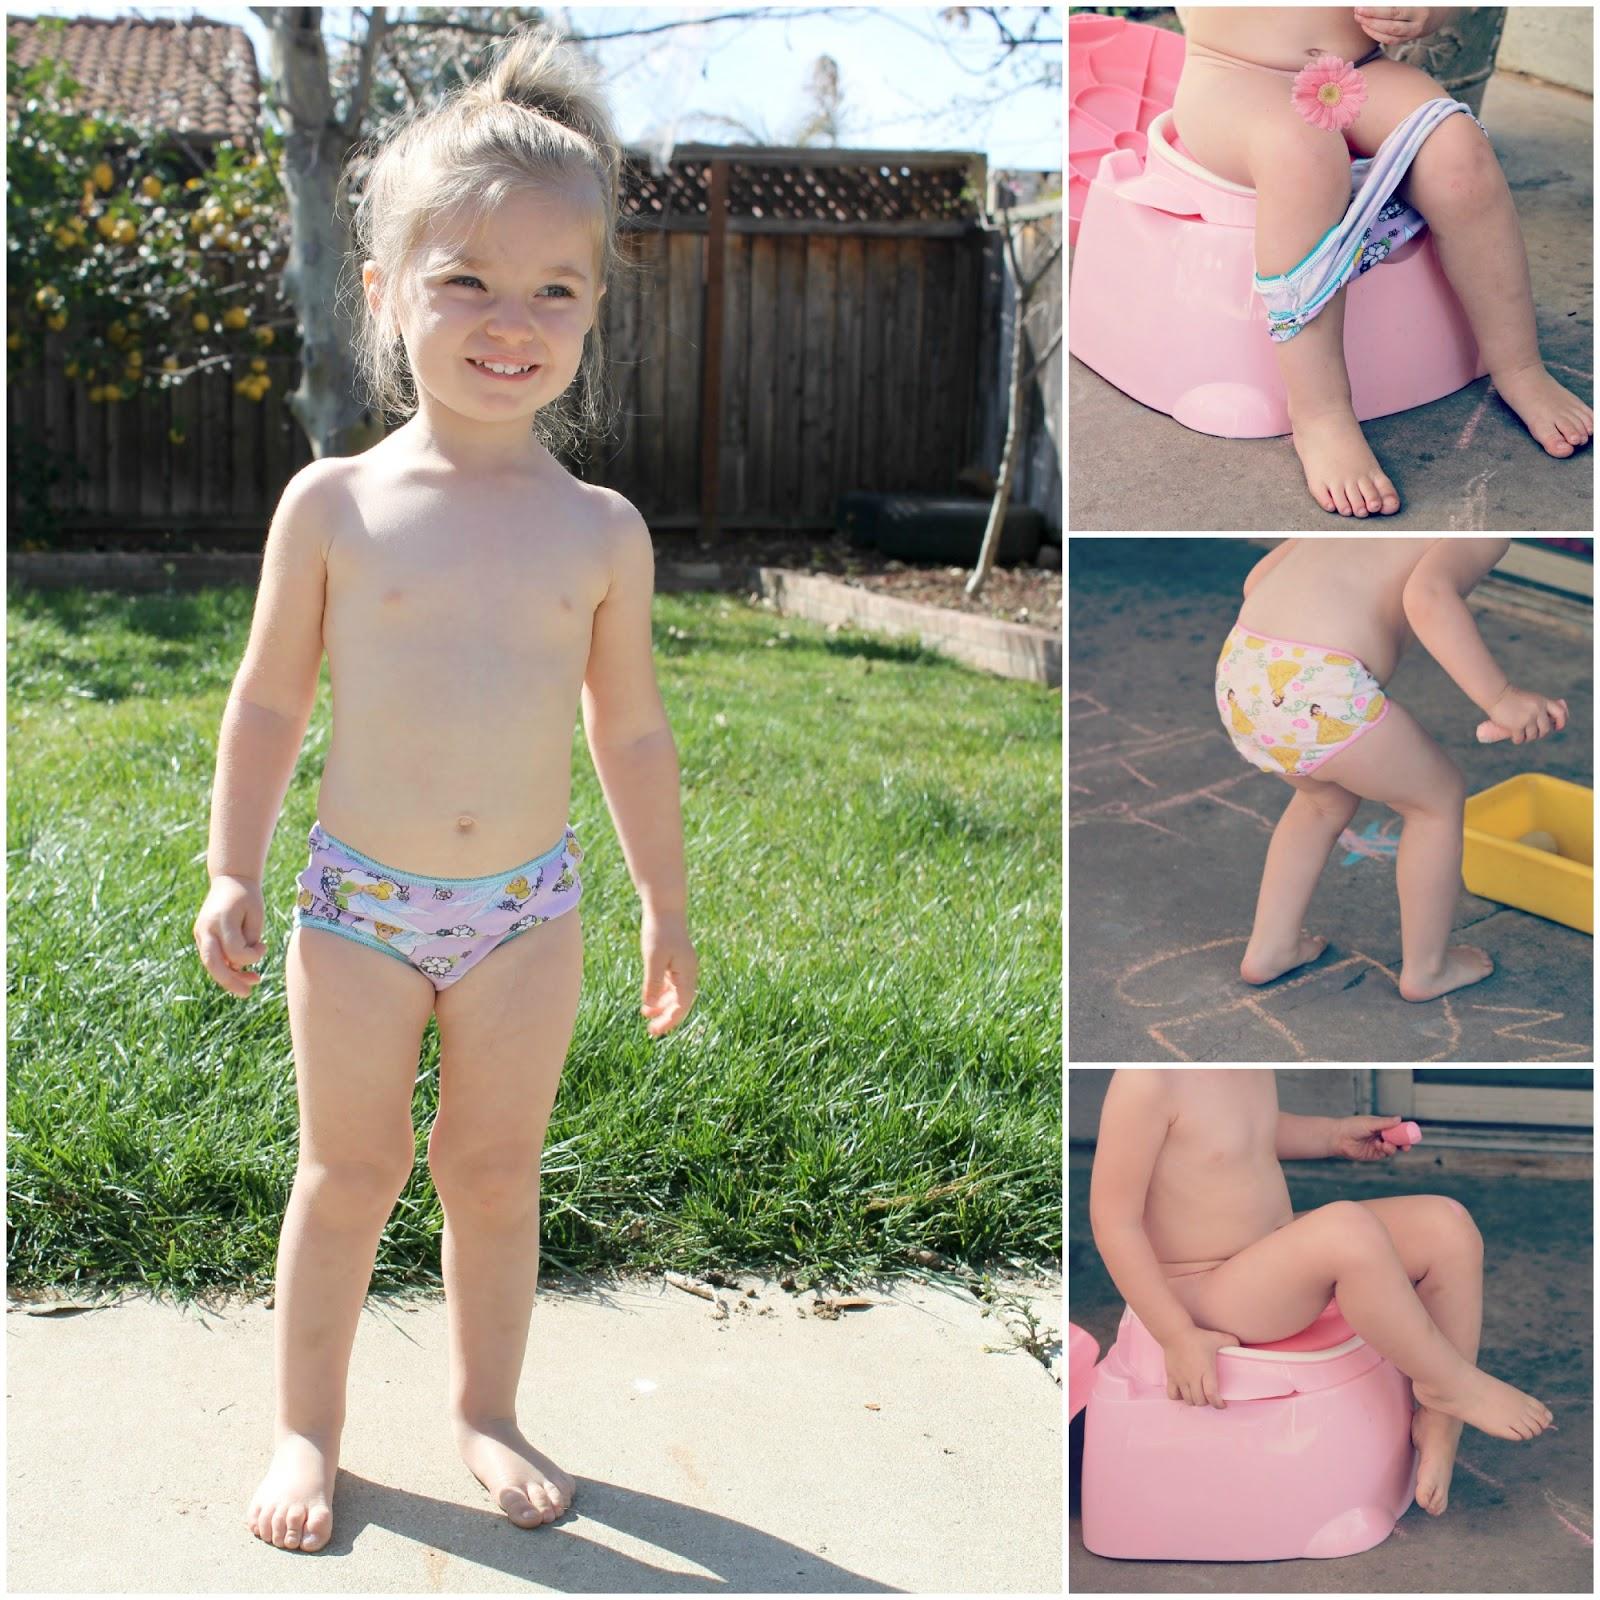 Baby Little Underwear Modles Picture